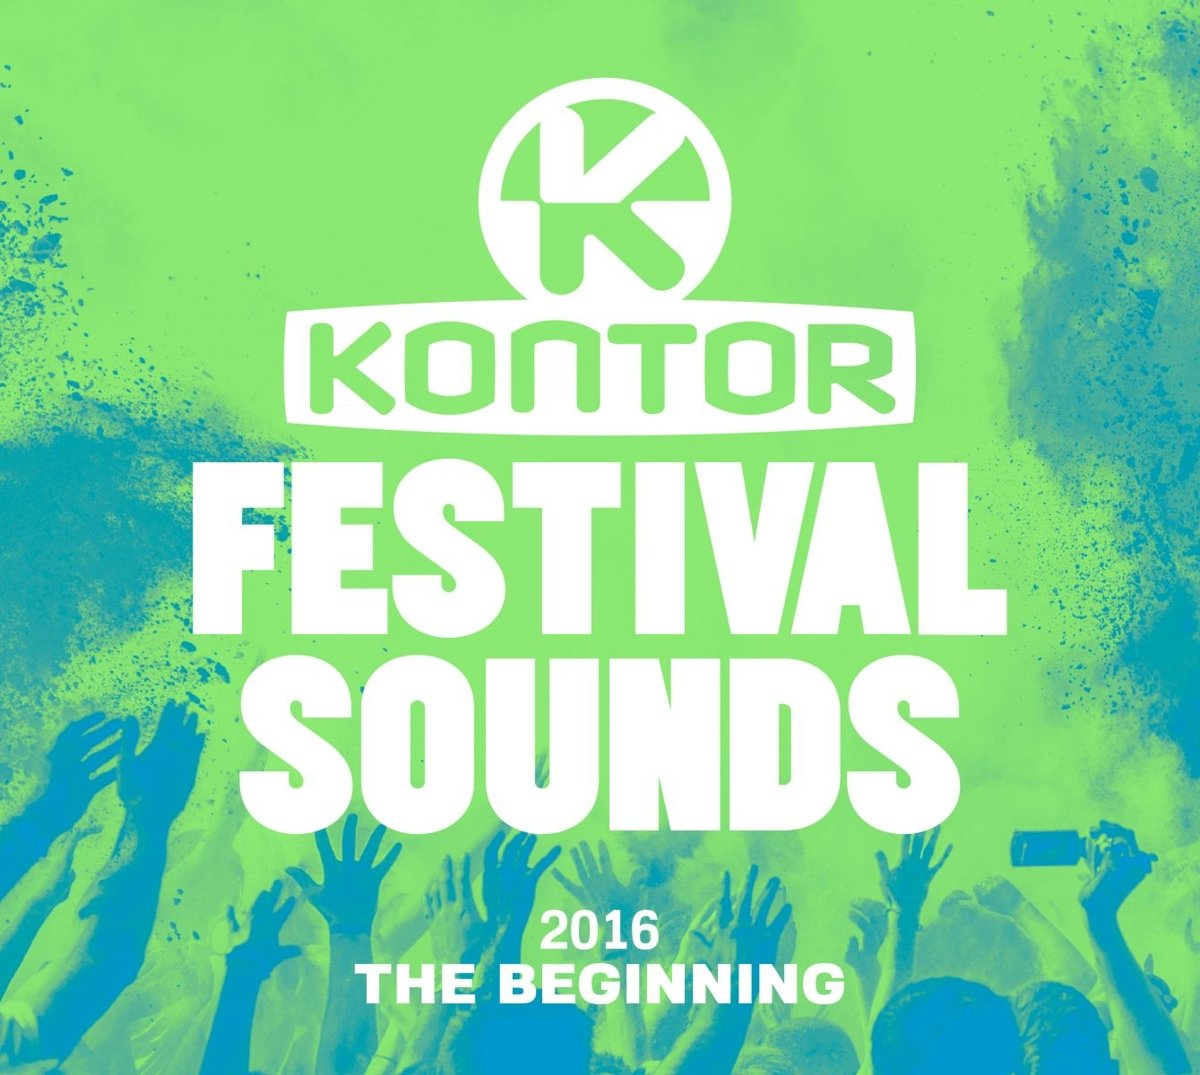 VA-Kontor Festival Sounds 2016-The Beginning-3CD-2016-VOiCE Download